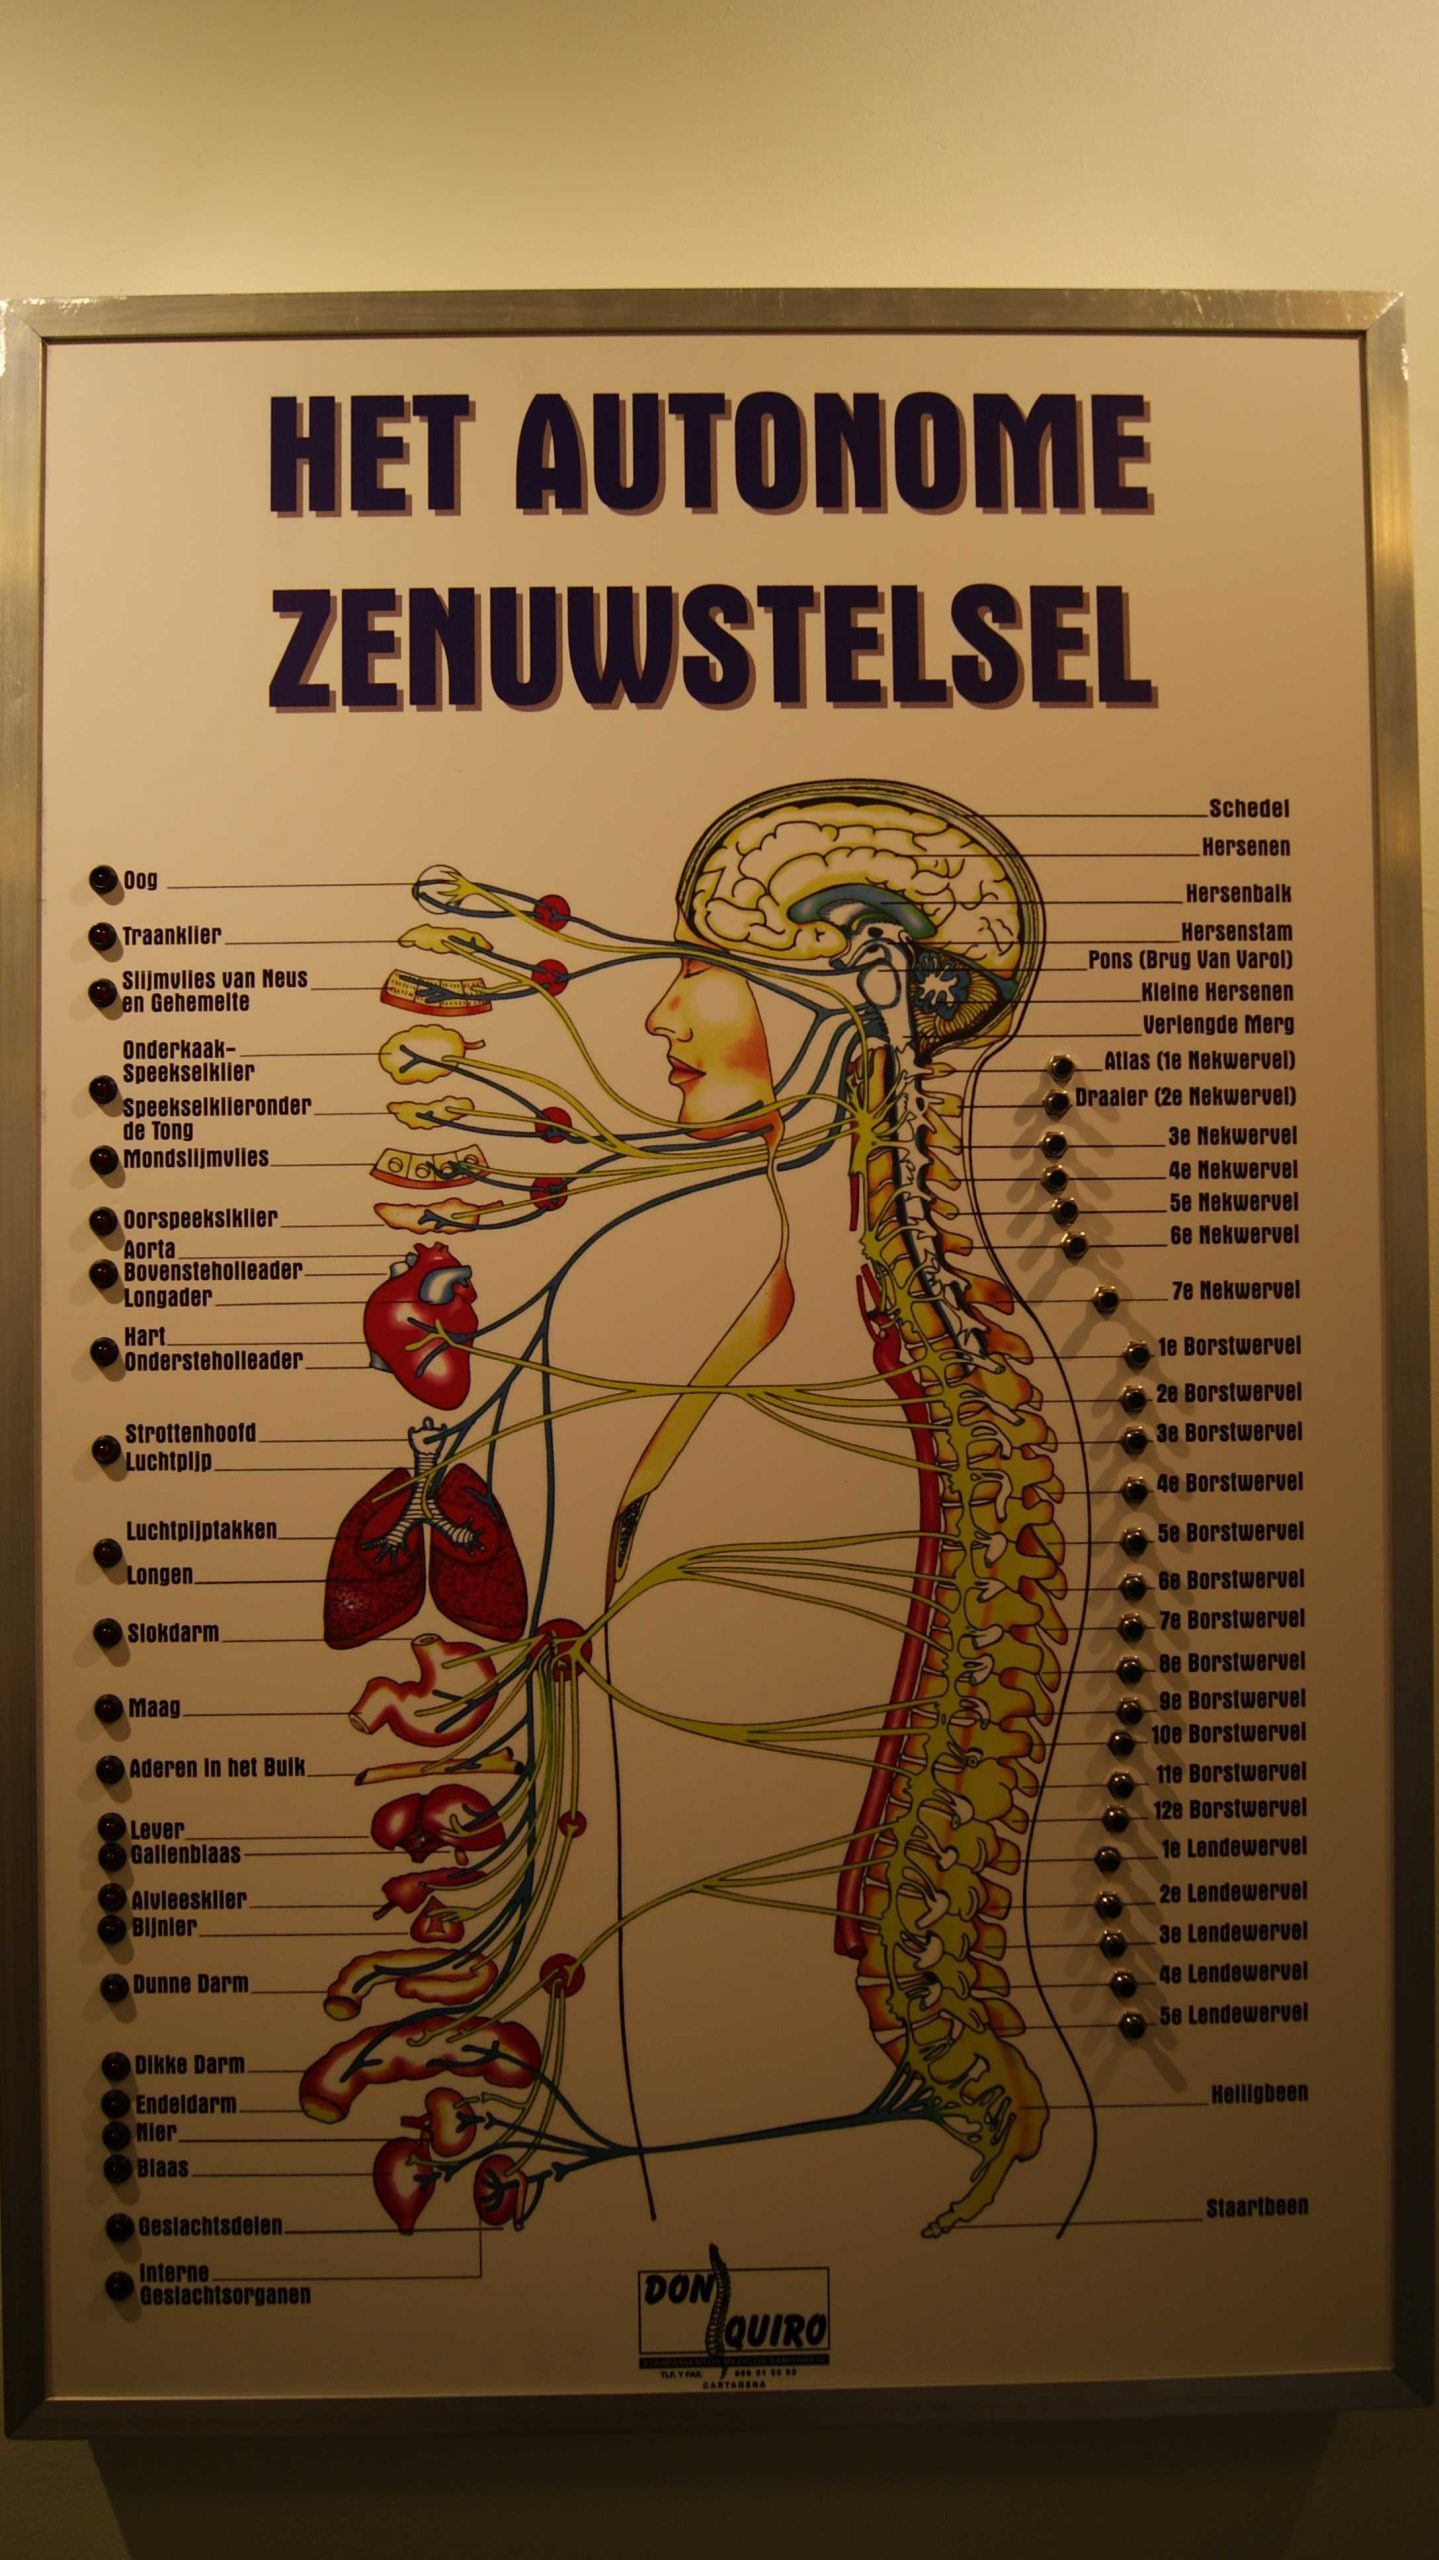 Het Autonome Zenuwstelsel